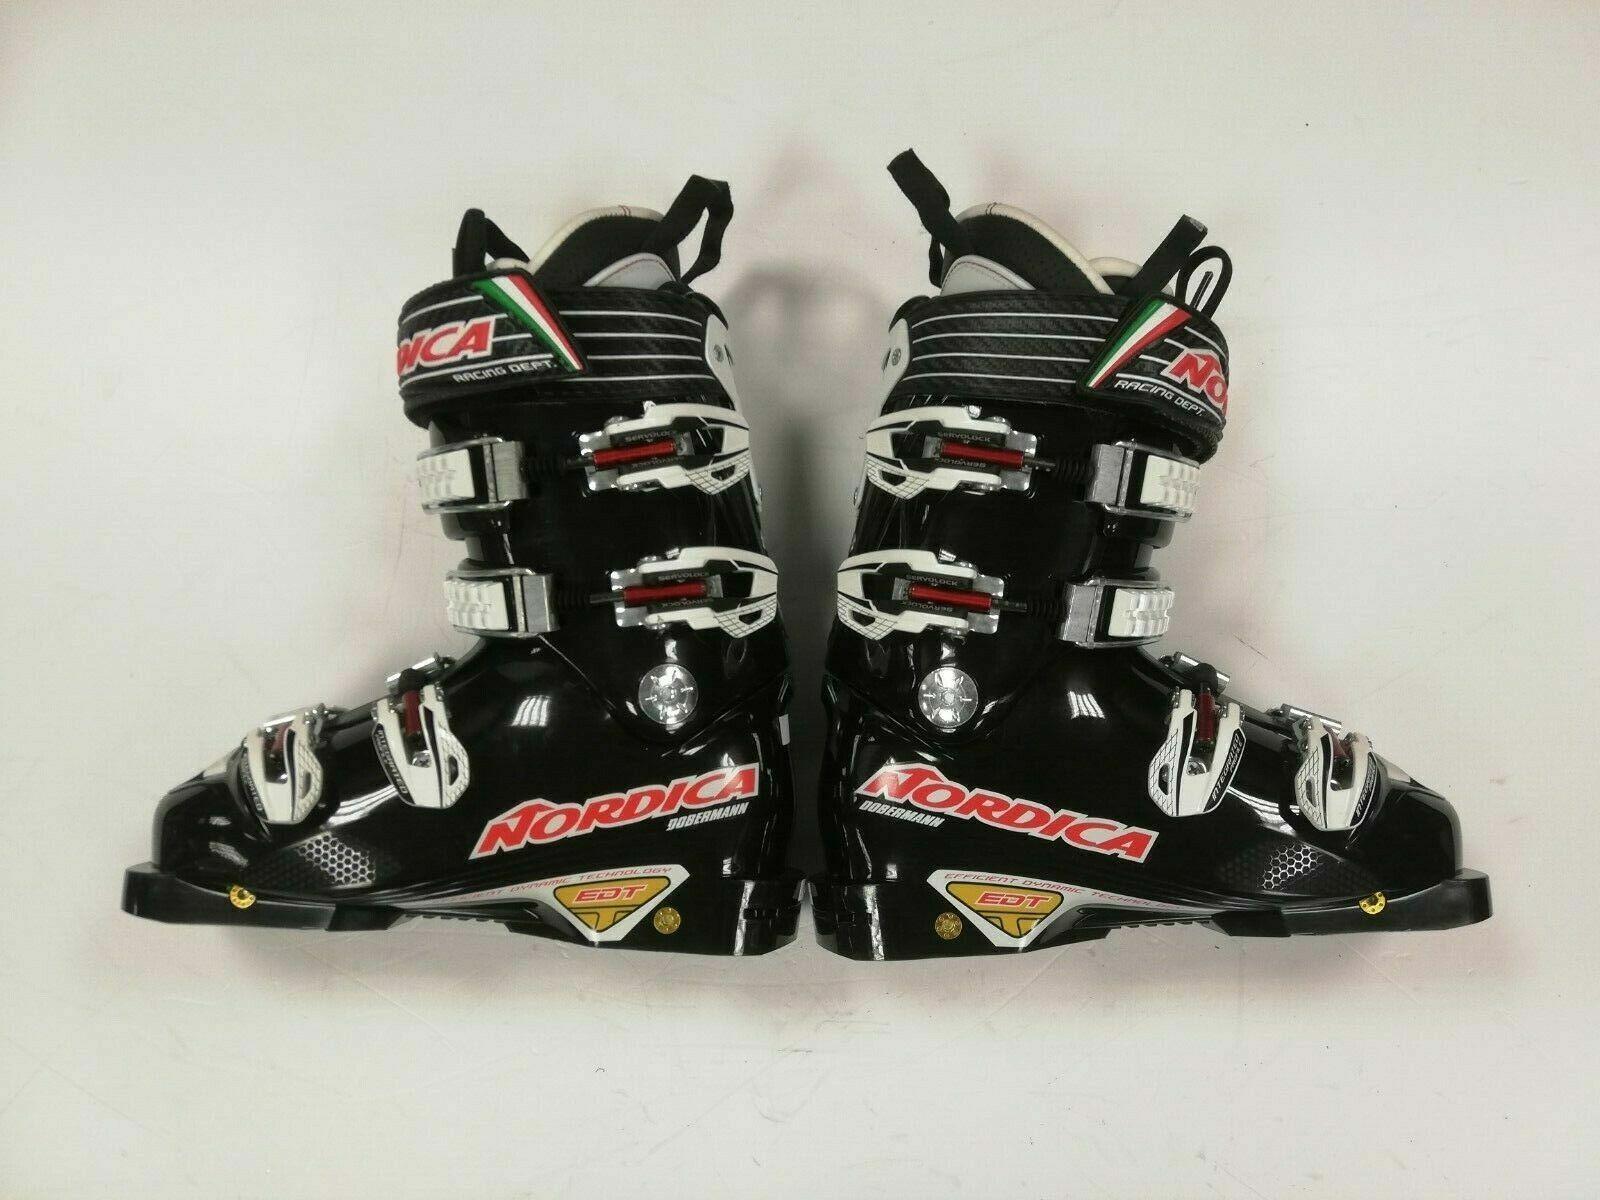 Nordica Dobermann WC EDT 150 Ski Boots